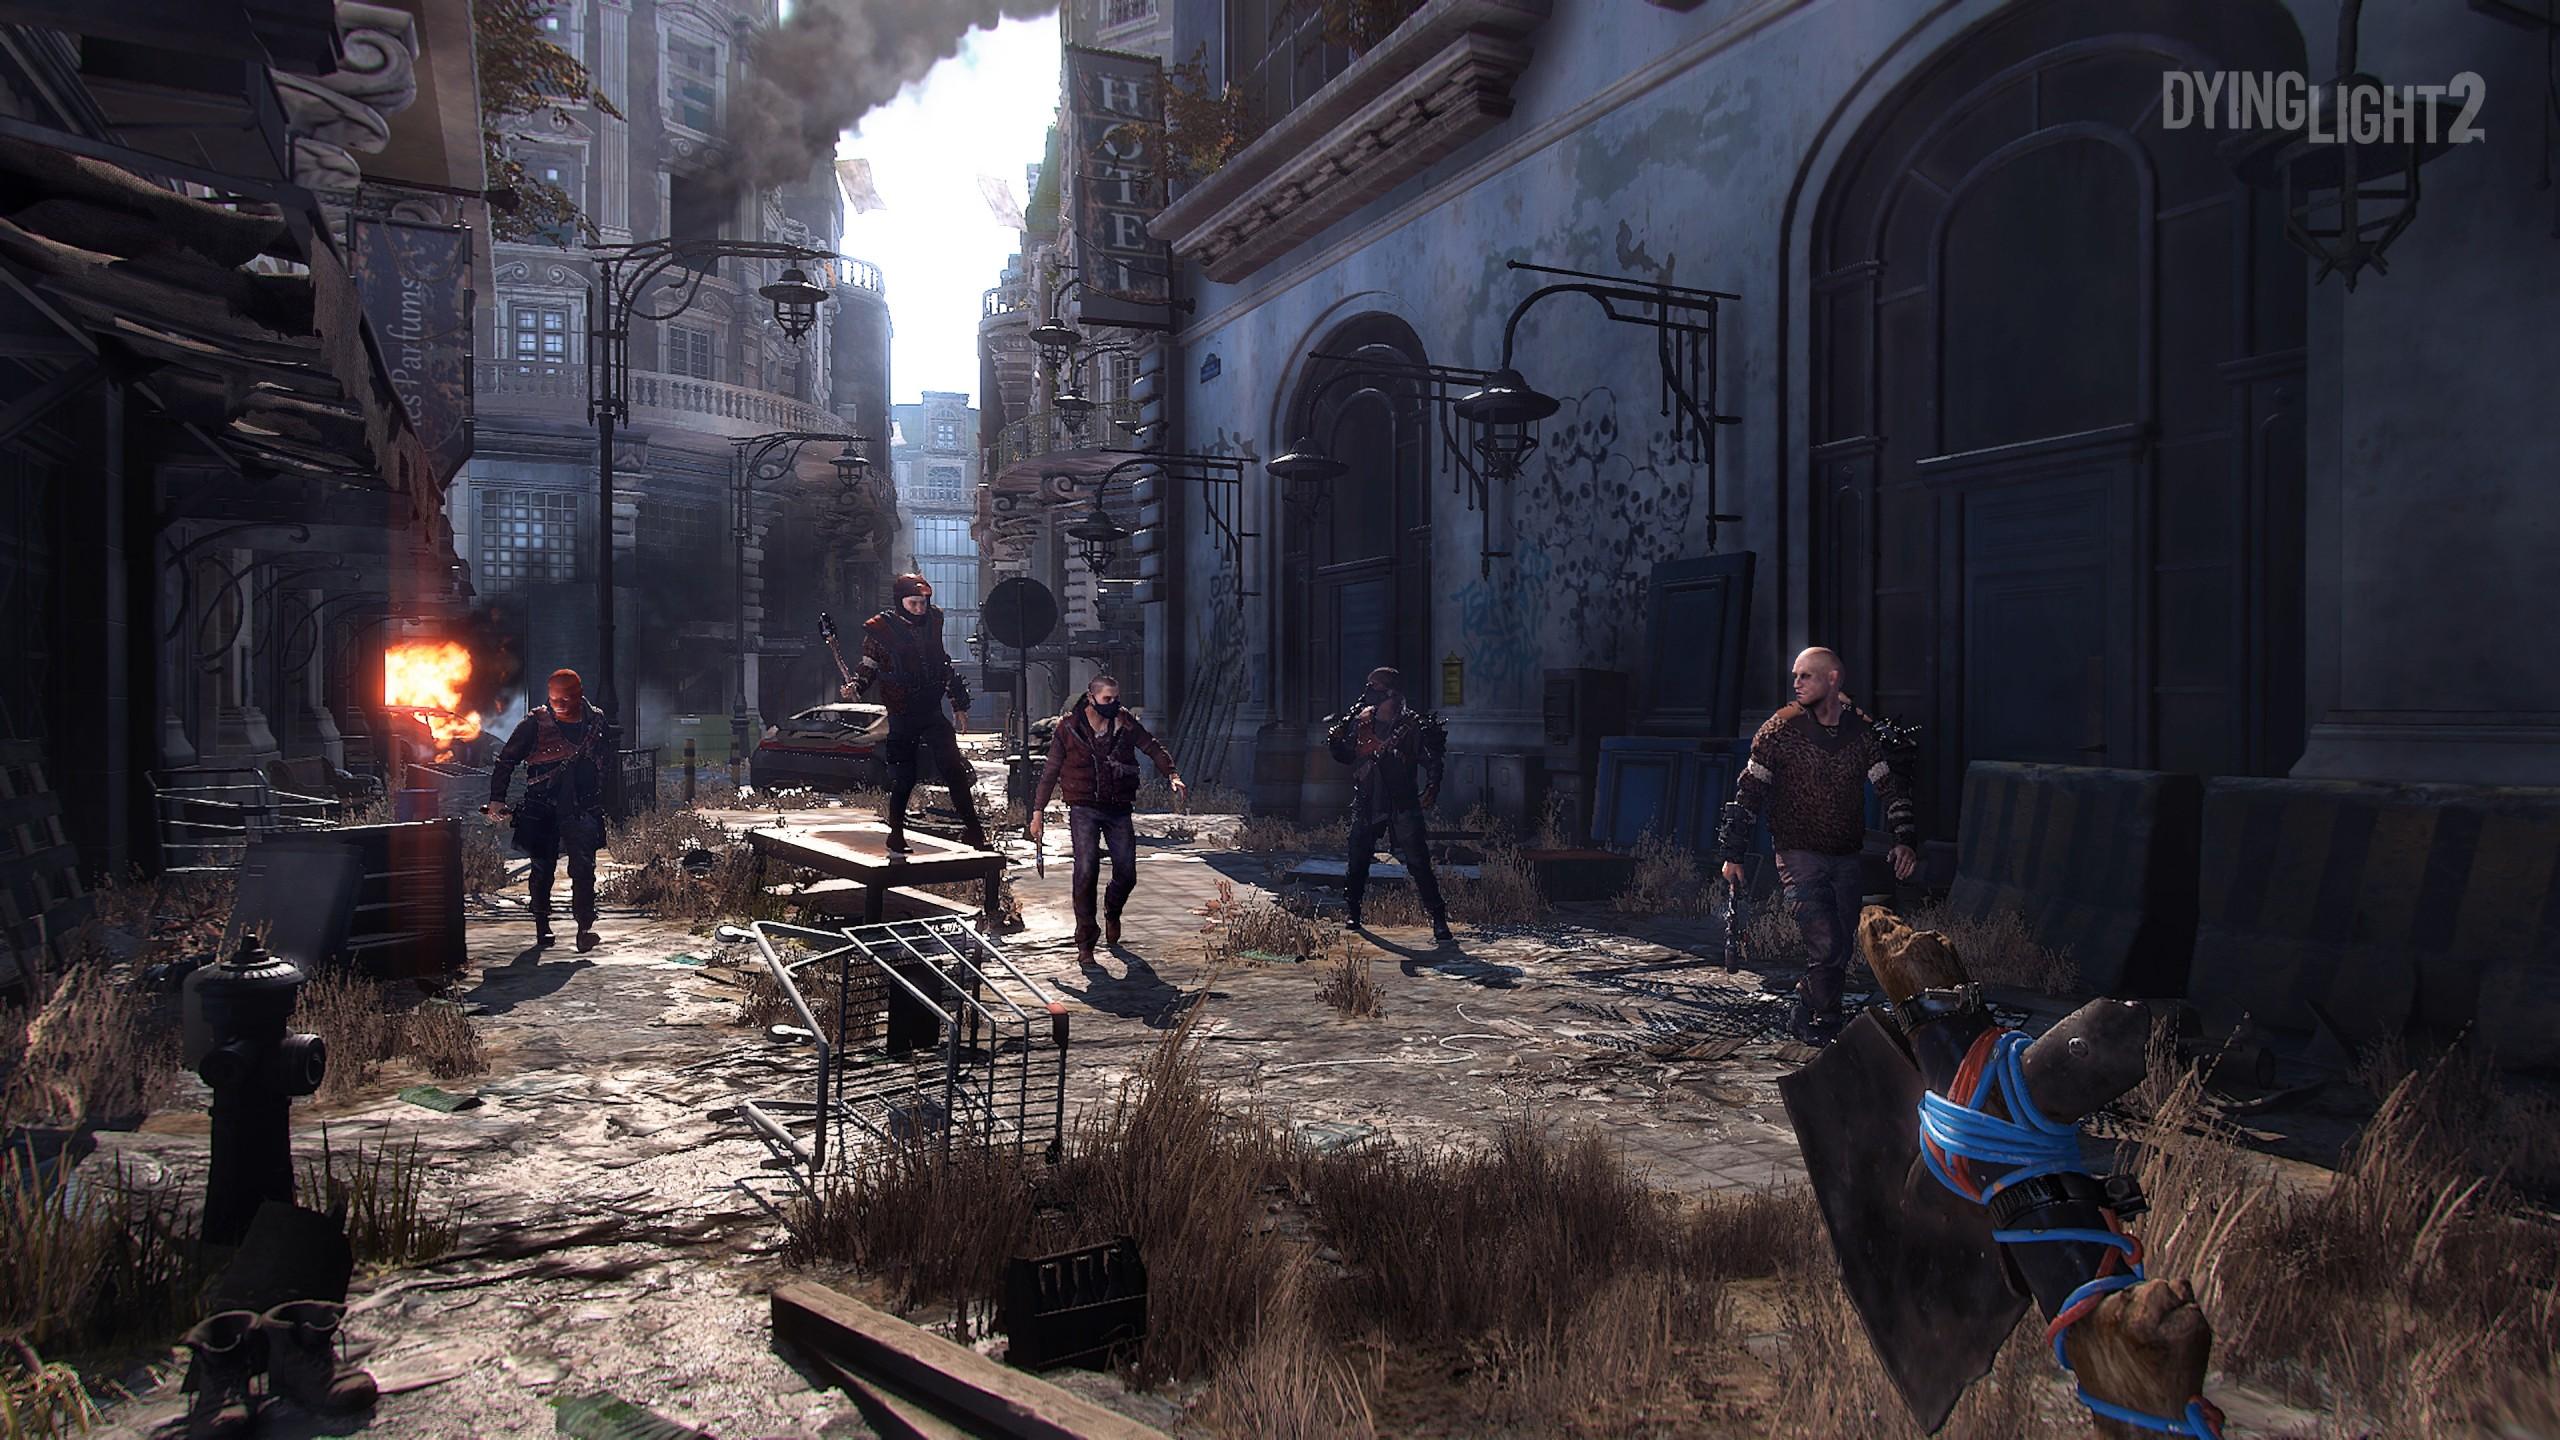 Wallpaper Dying Light 2 E3 2018 Screenshot 4k Games 19025